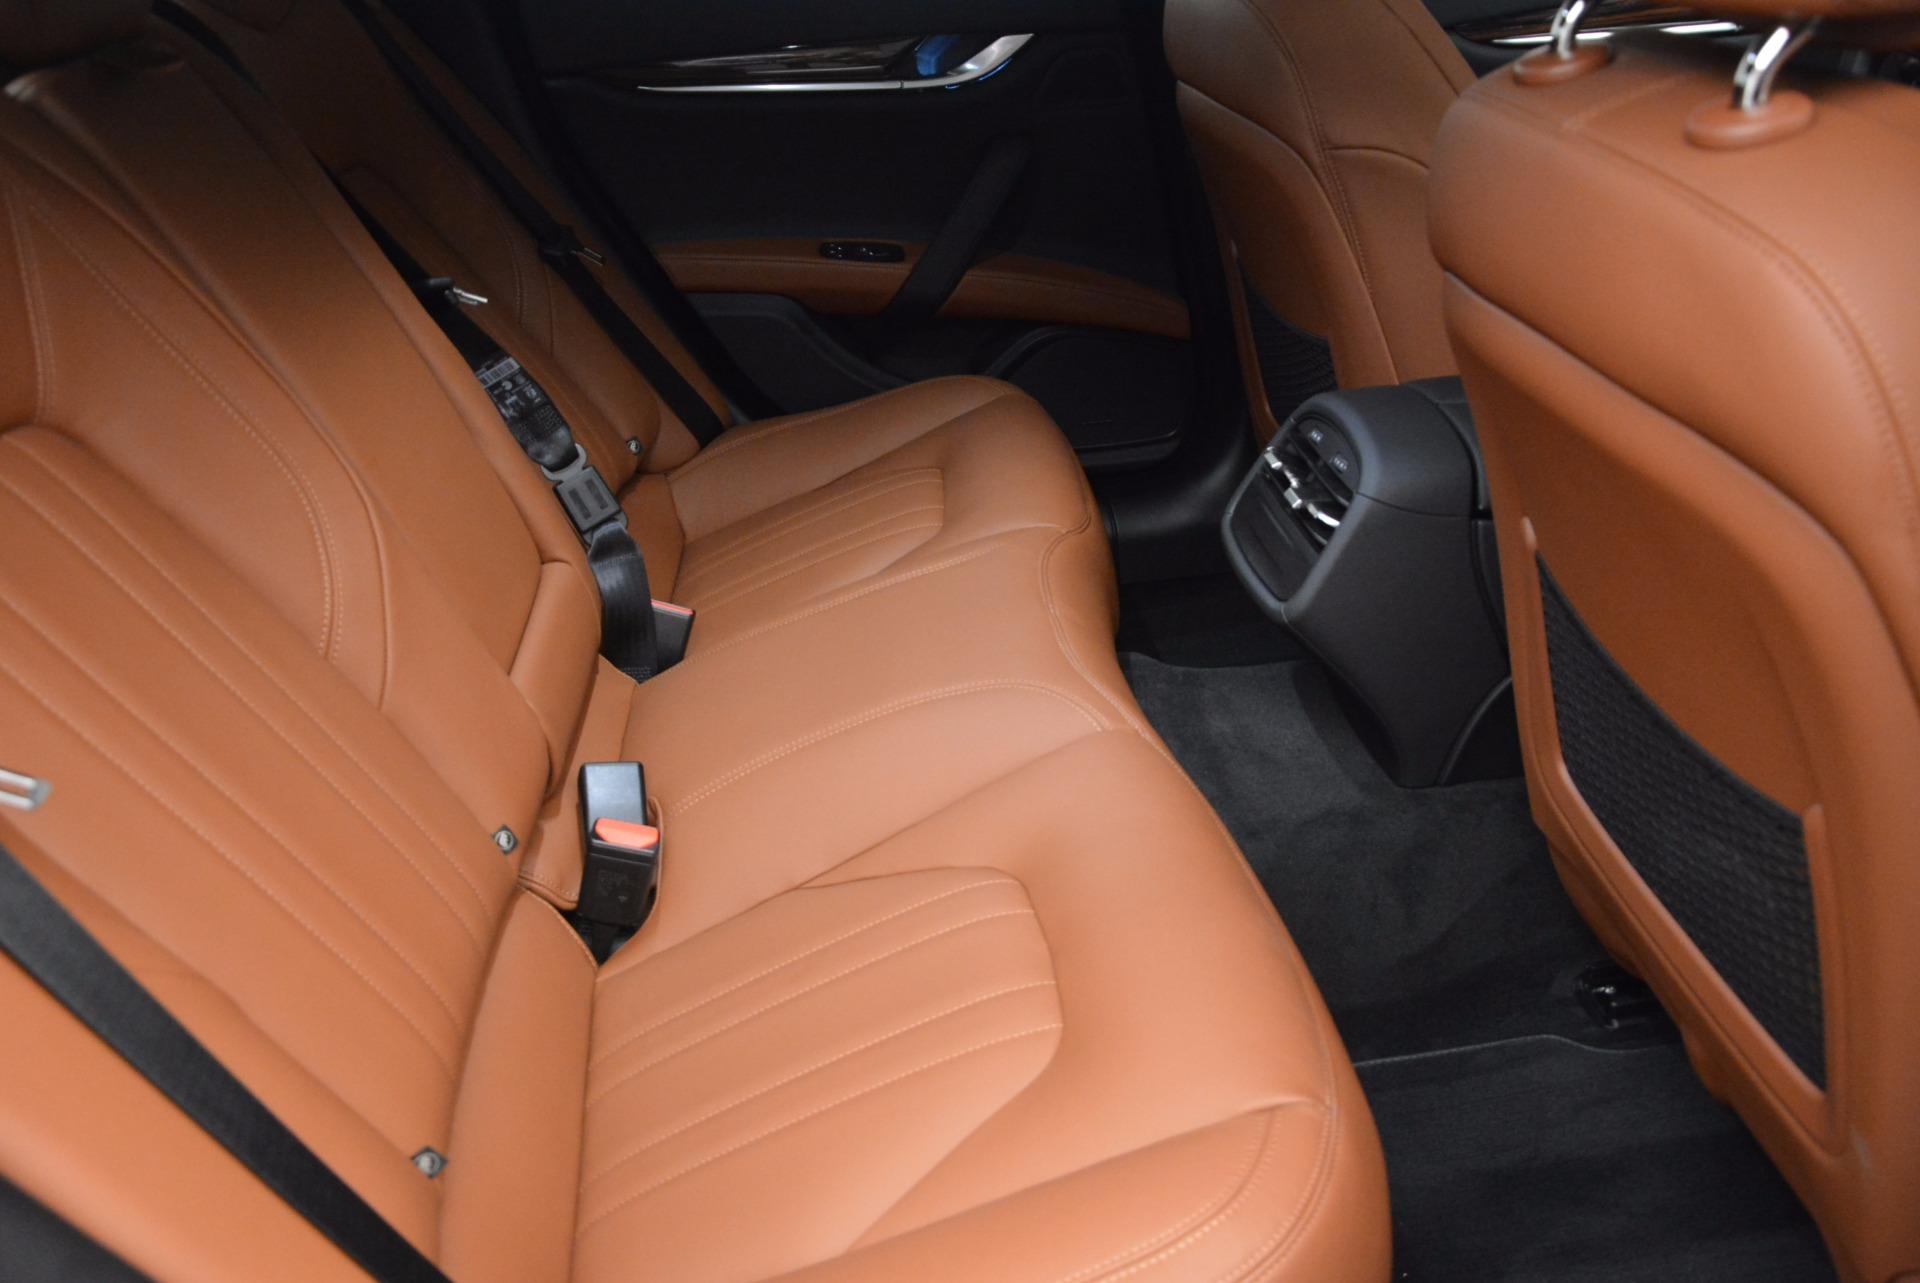 Used 2017 Maserati Ghibli S Q4 For Sale In Westport, CT 682_p20